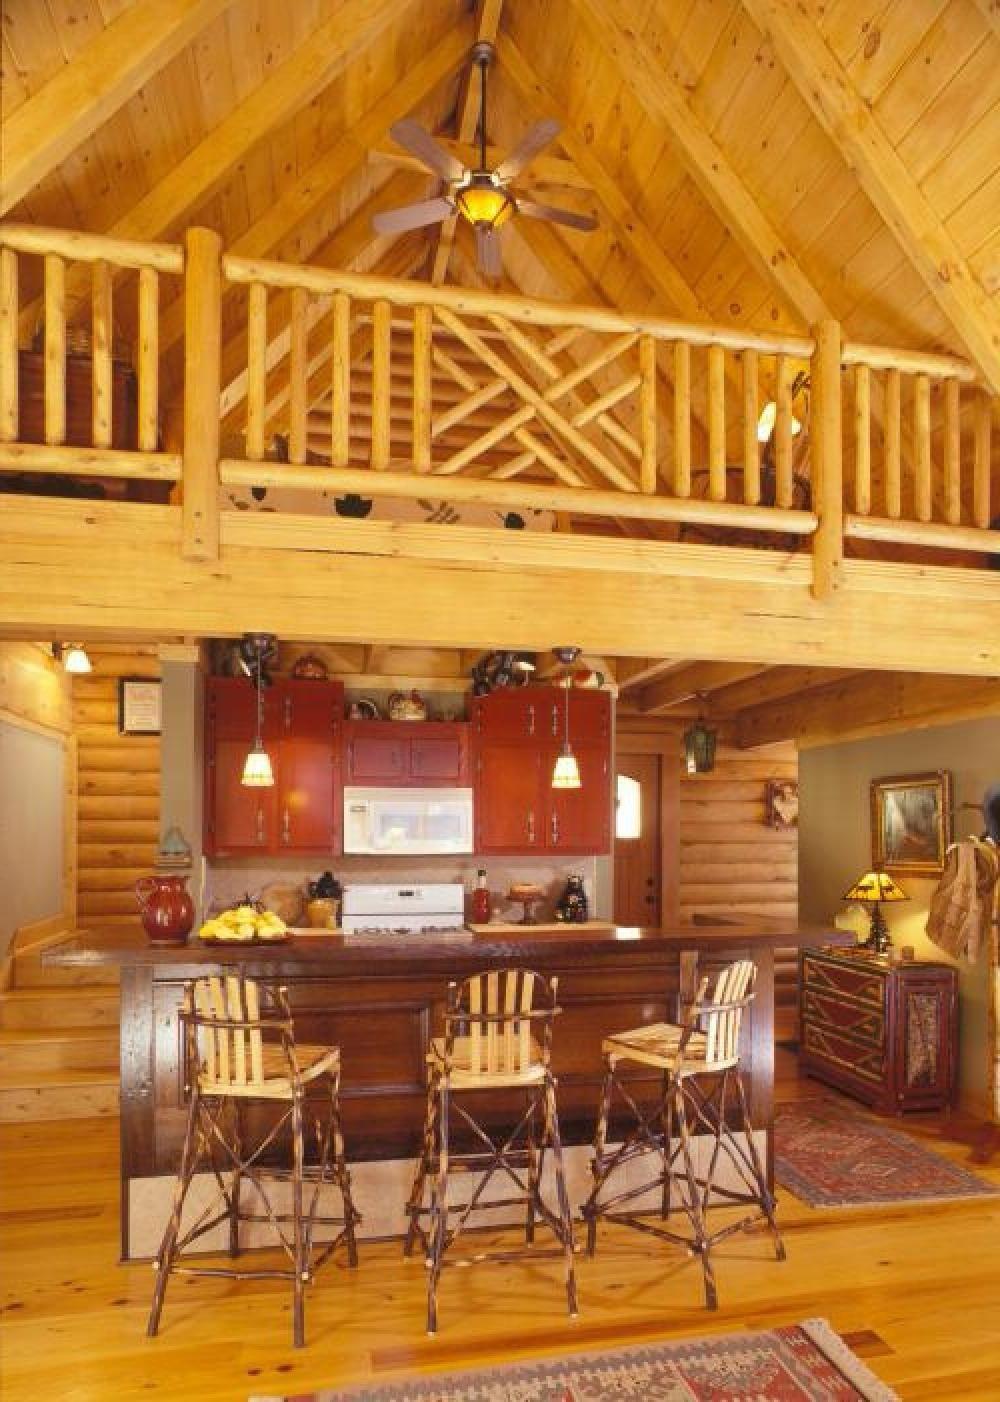 Rustic Kitchen Design With Mini Bar Under Mezzanine Of Rustic ...